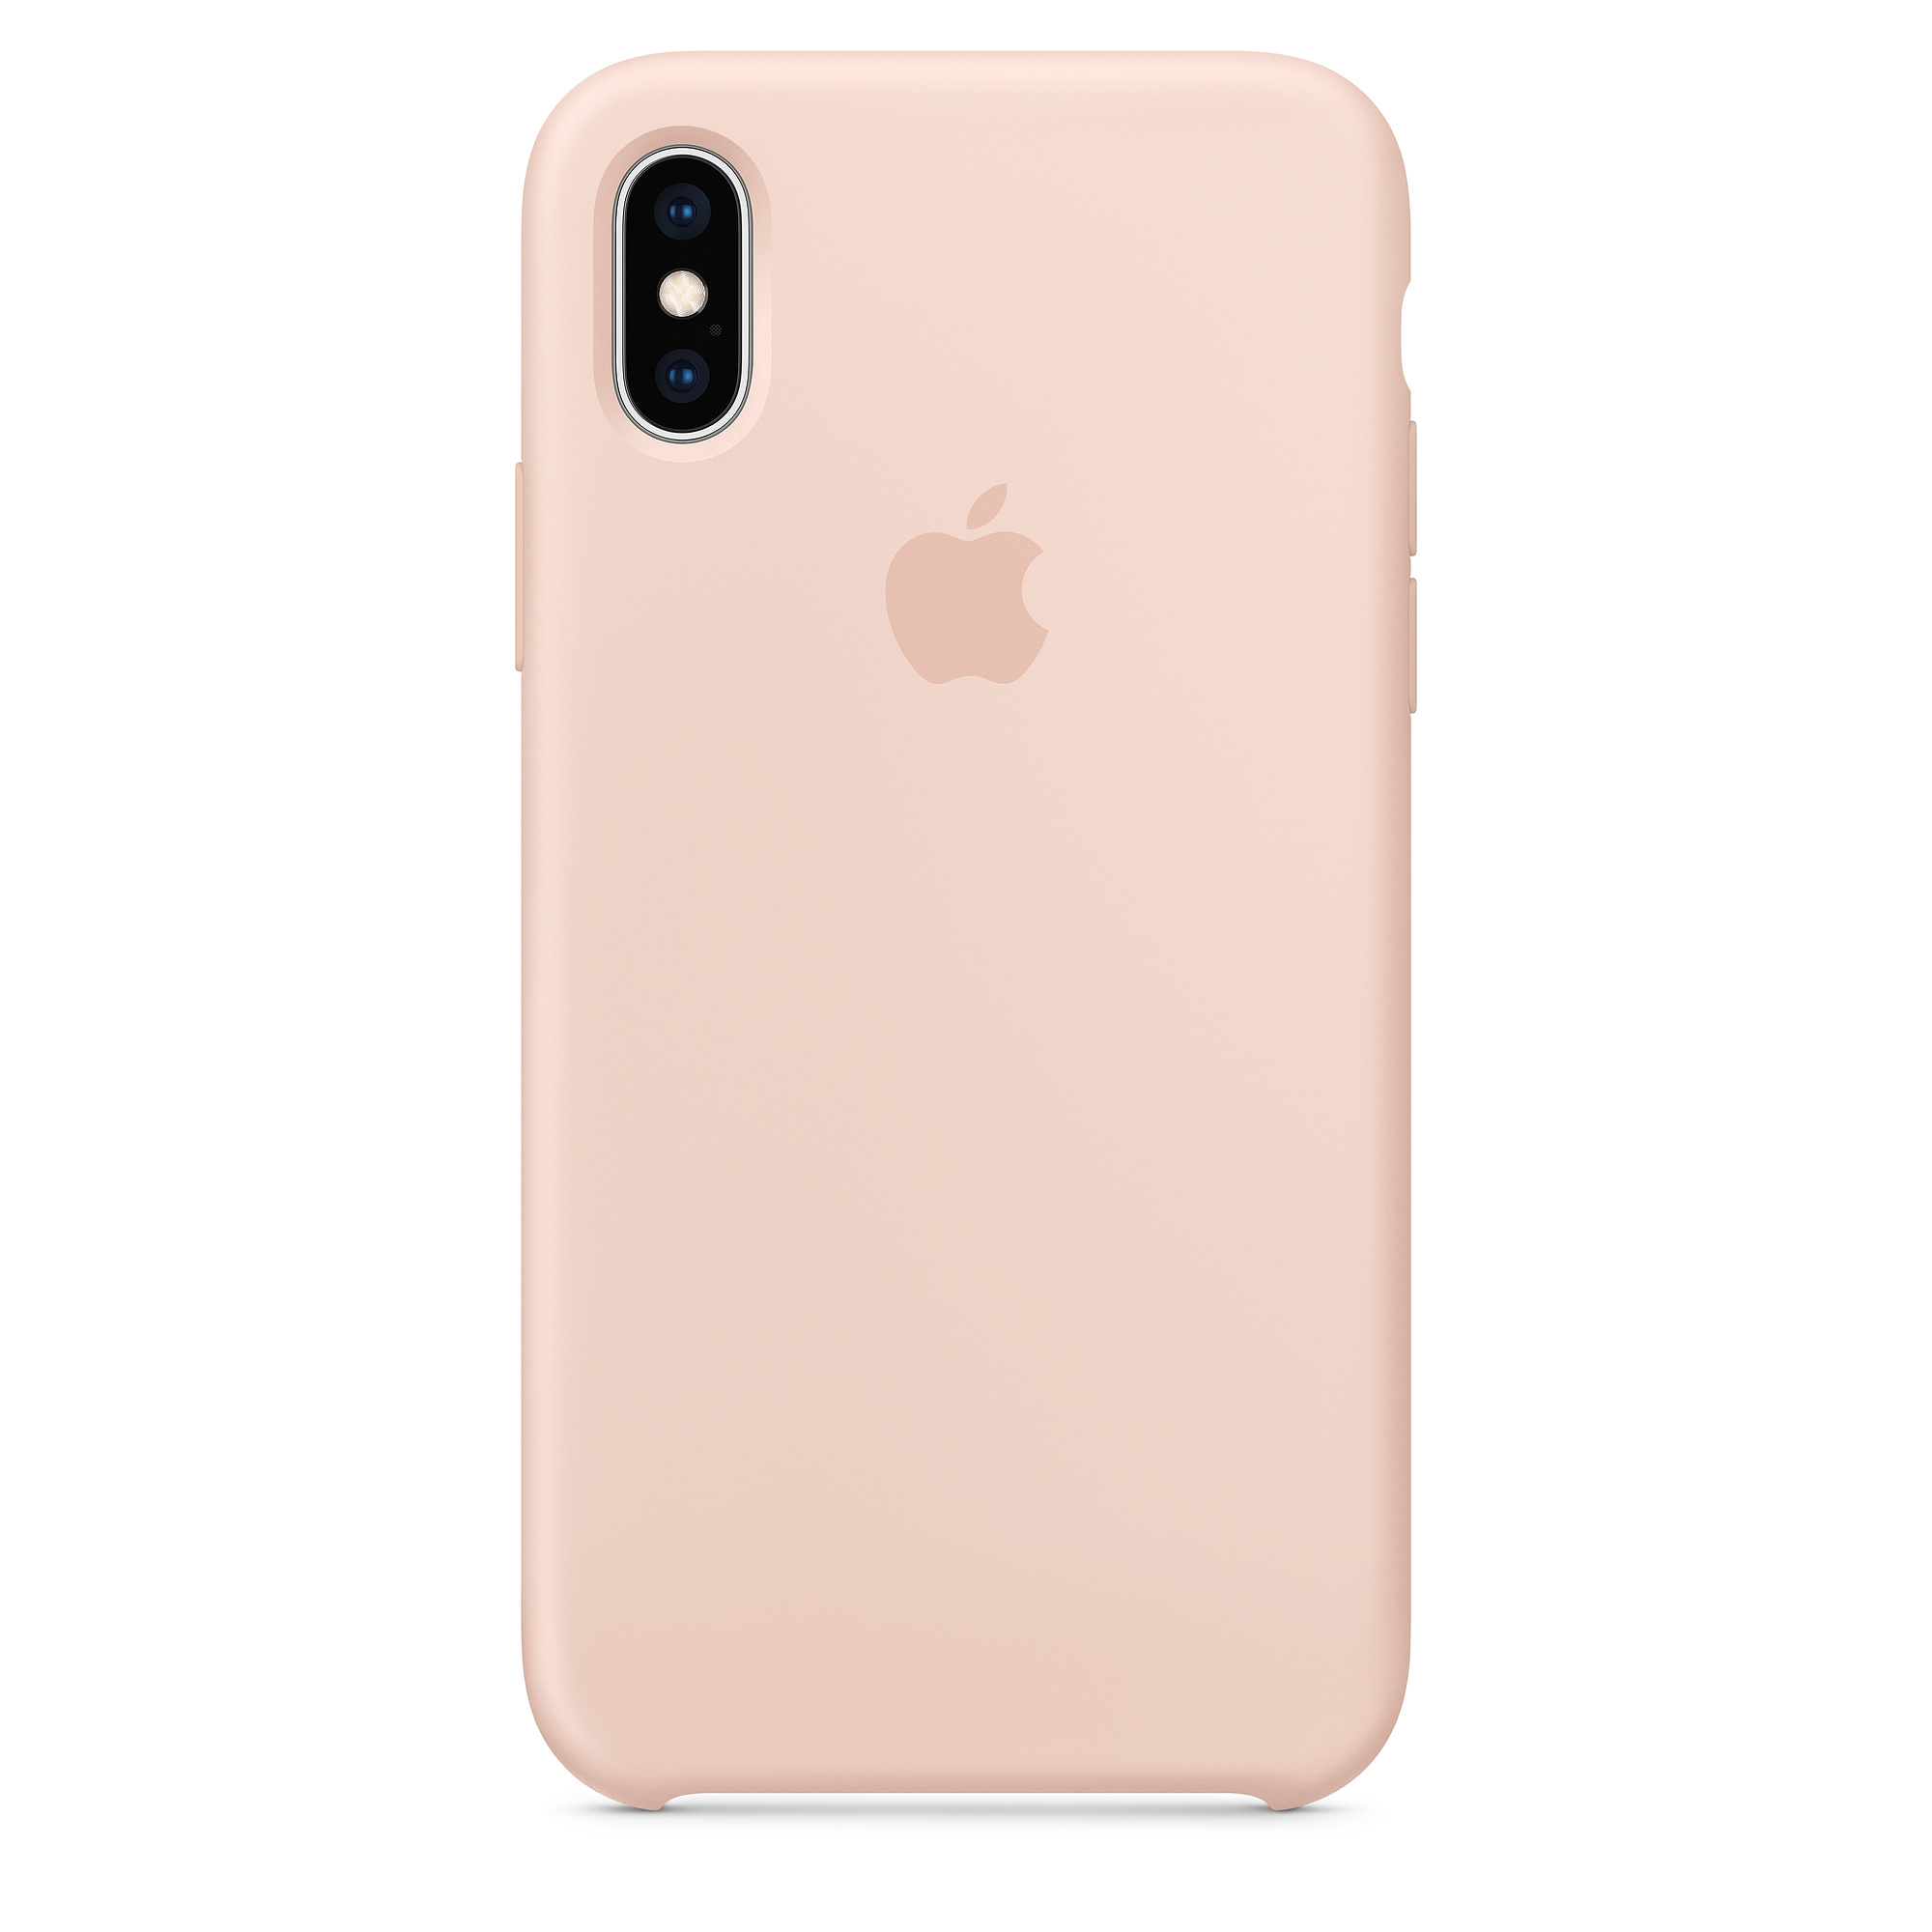 Купить Чехол-накладка Apple Silicone Case Series для iPhone XS силикон Pink Sand (MTF82ZM/A)